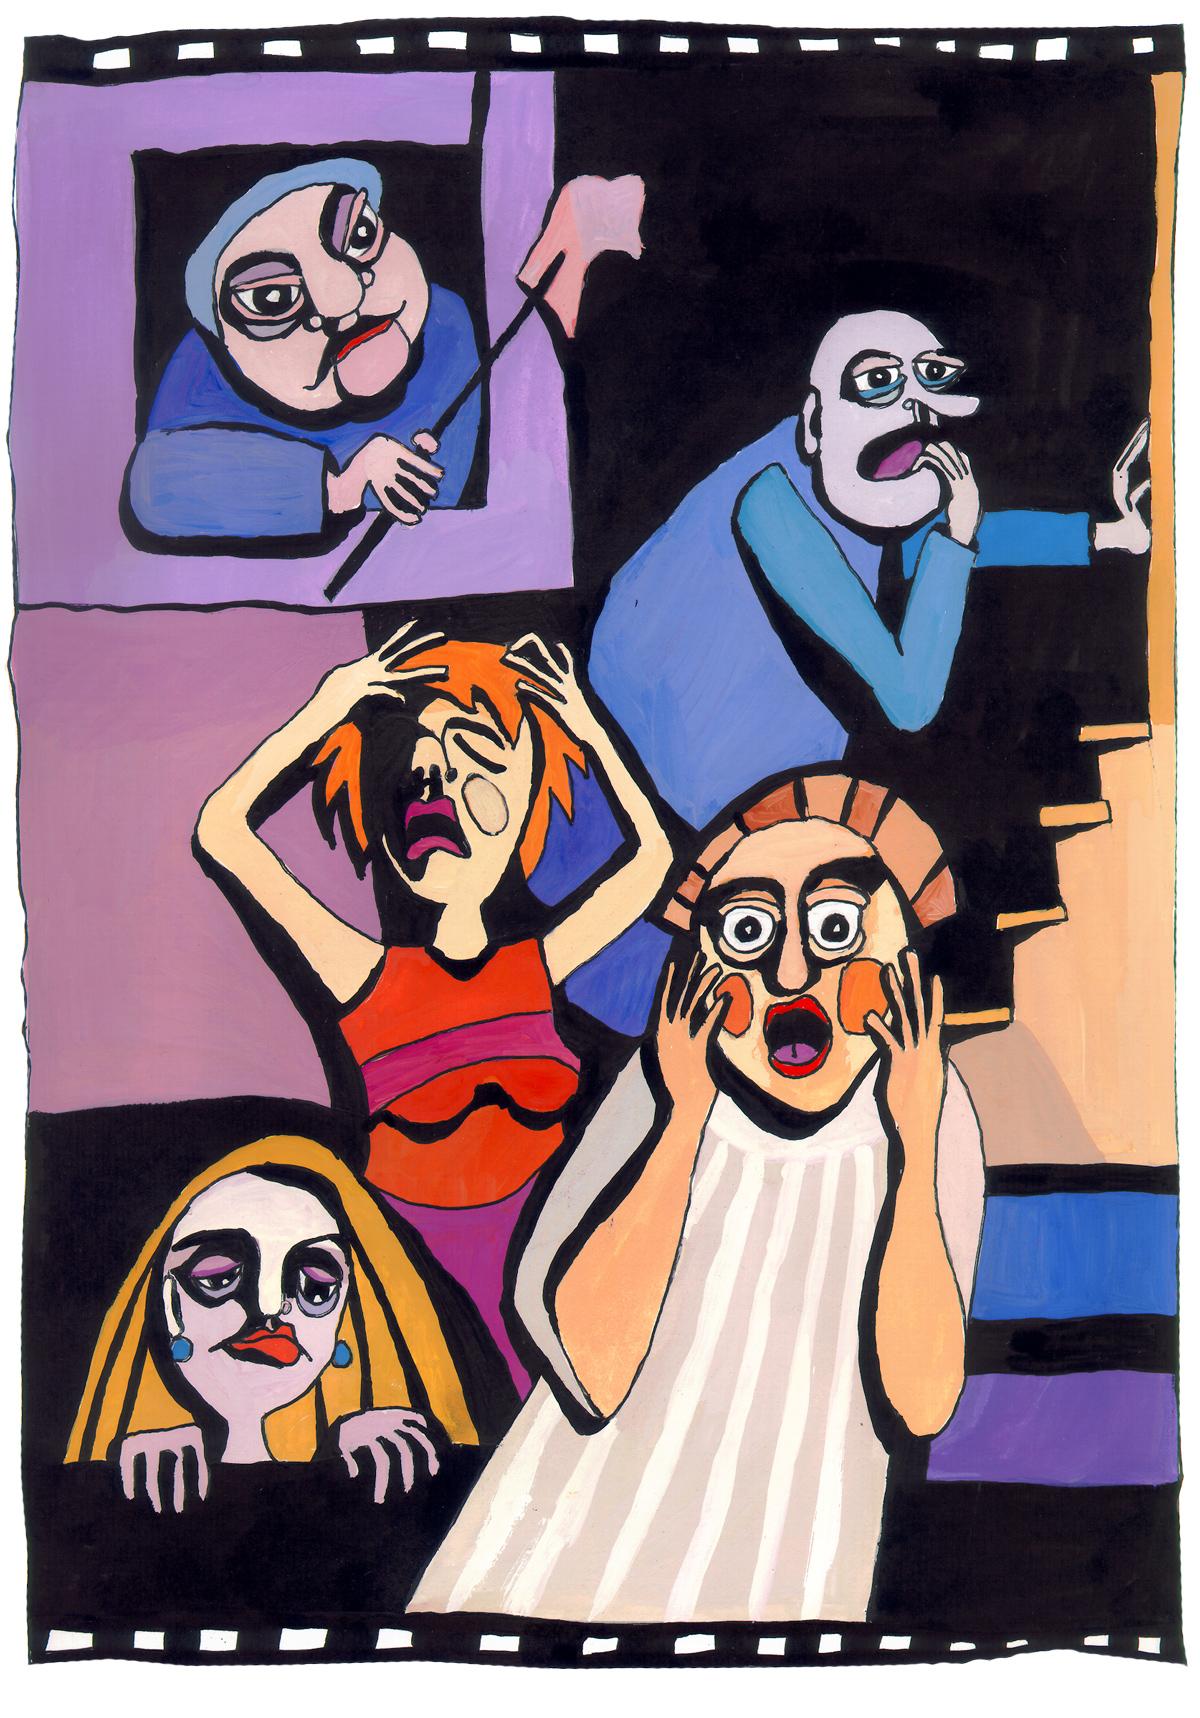 5 Emotionen. 5 emocijas. Ieva Kunga. 2003